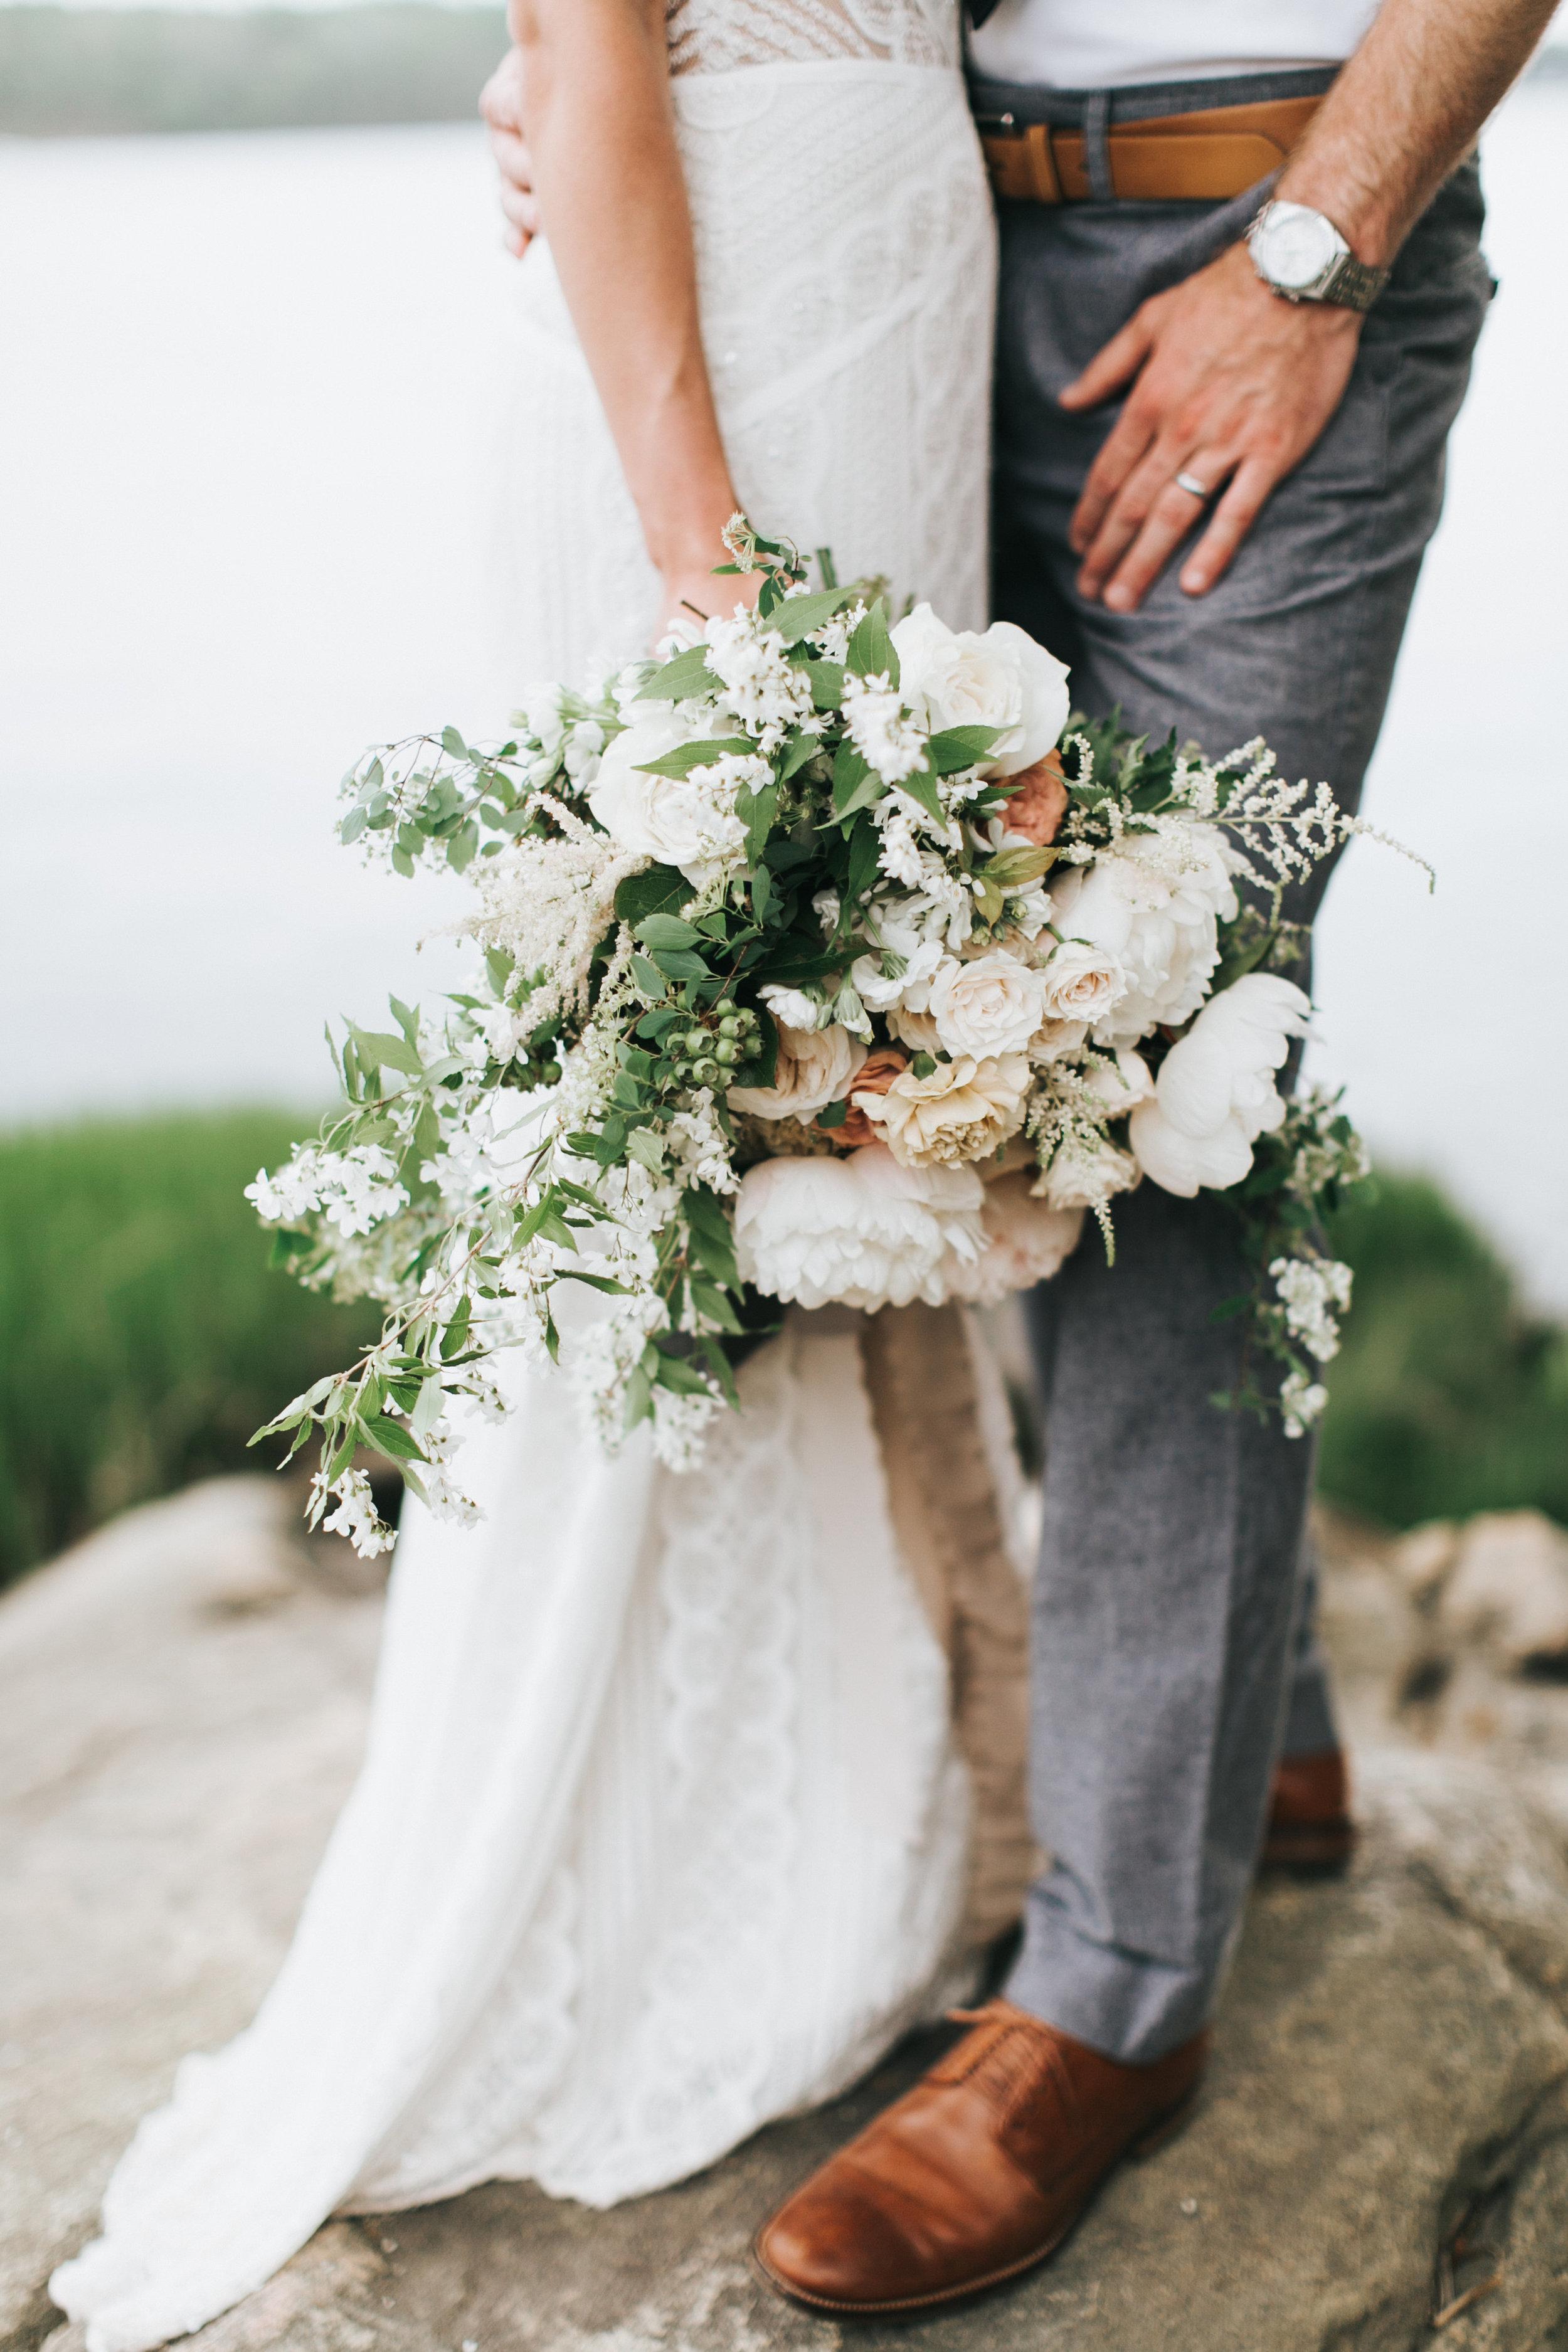 Watershed-Floral-Maine-Maritime-Wedding-Bridal-Bouquet-Centerpieces-0182.jpg